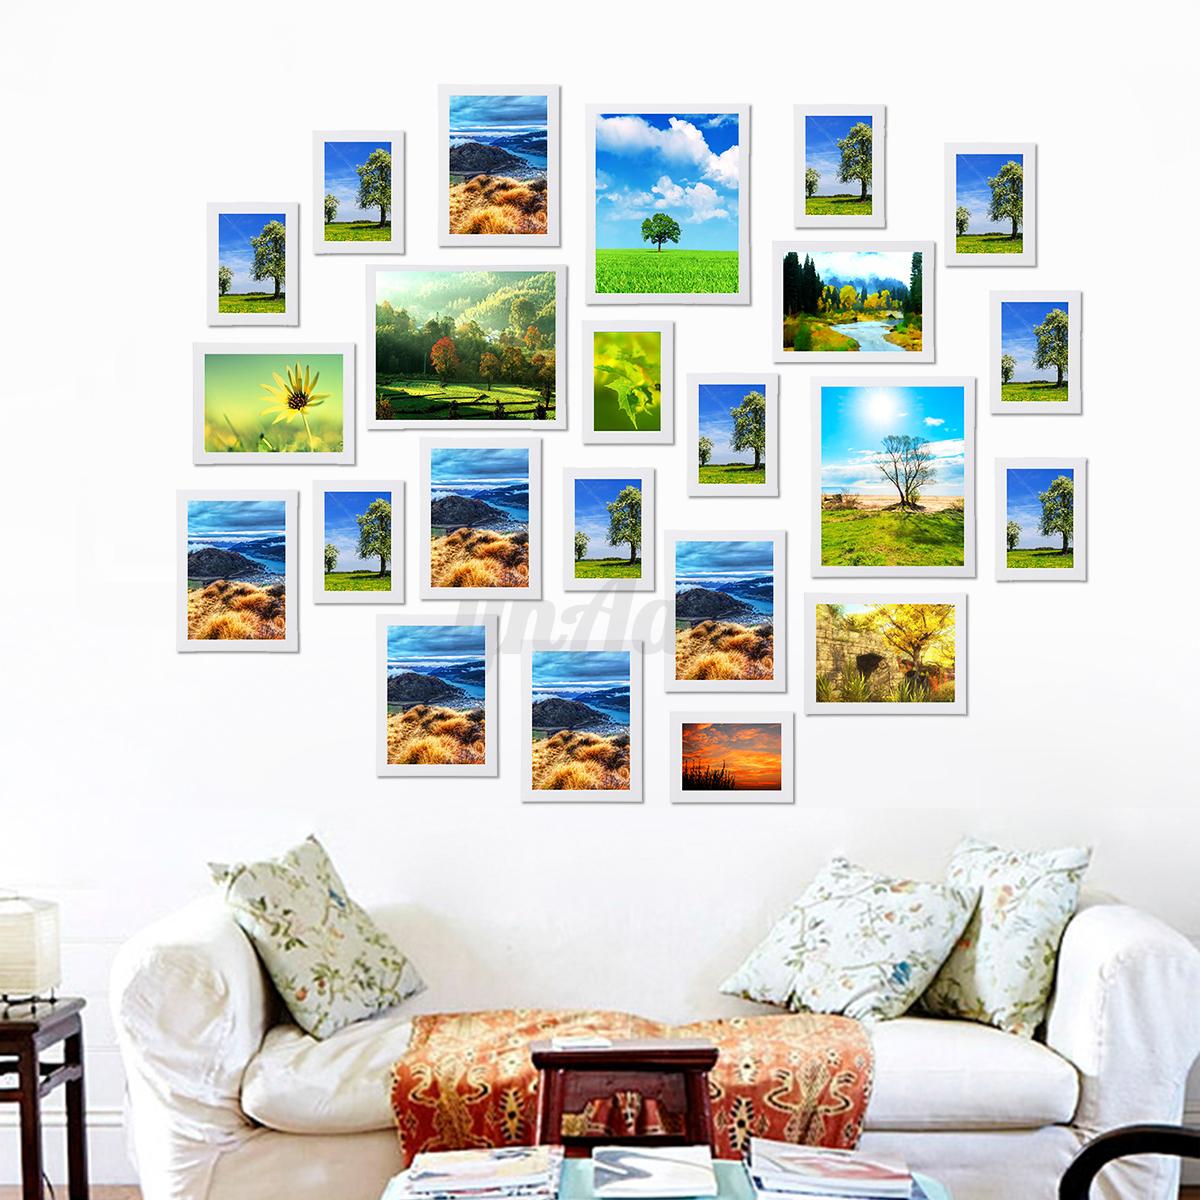 Home Decor Wall Art 2326Pcs Multi Photo Picture Frames Set Diy Home Decor Wall Art